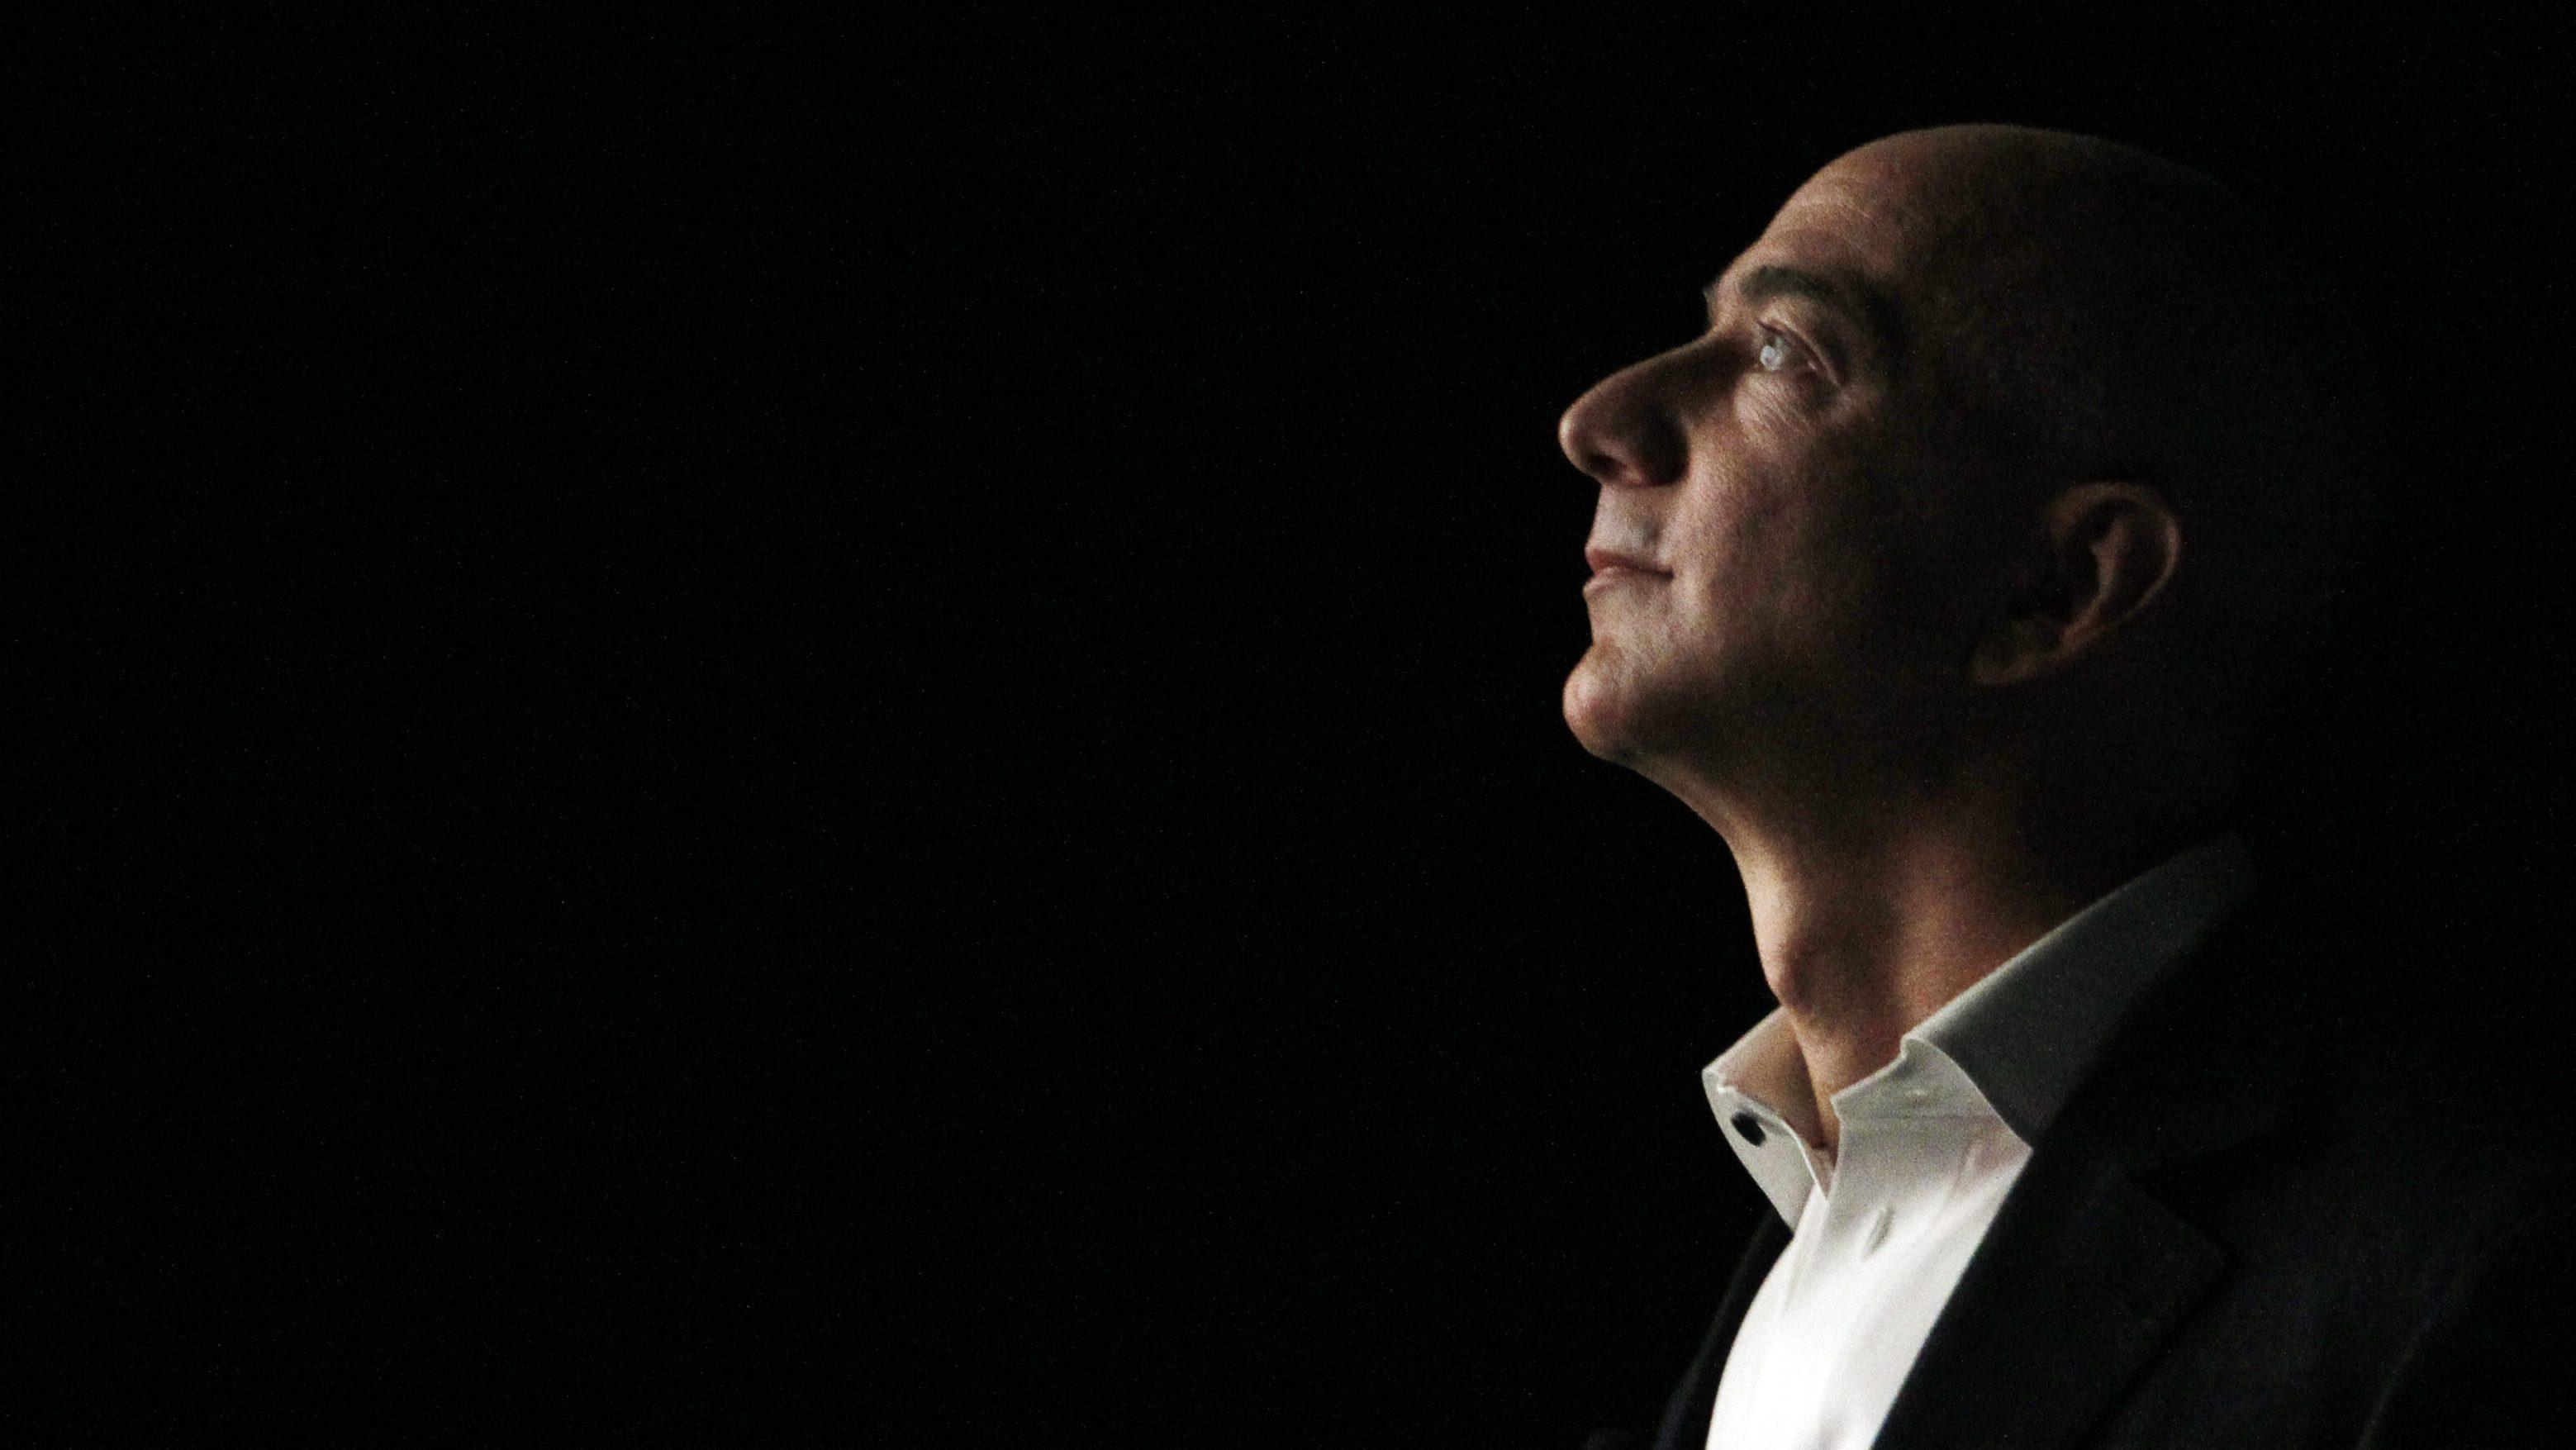 If Amazon Ceo Jeff Bezos Still Wants Philanthropy Ideas Roy Price